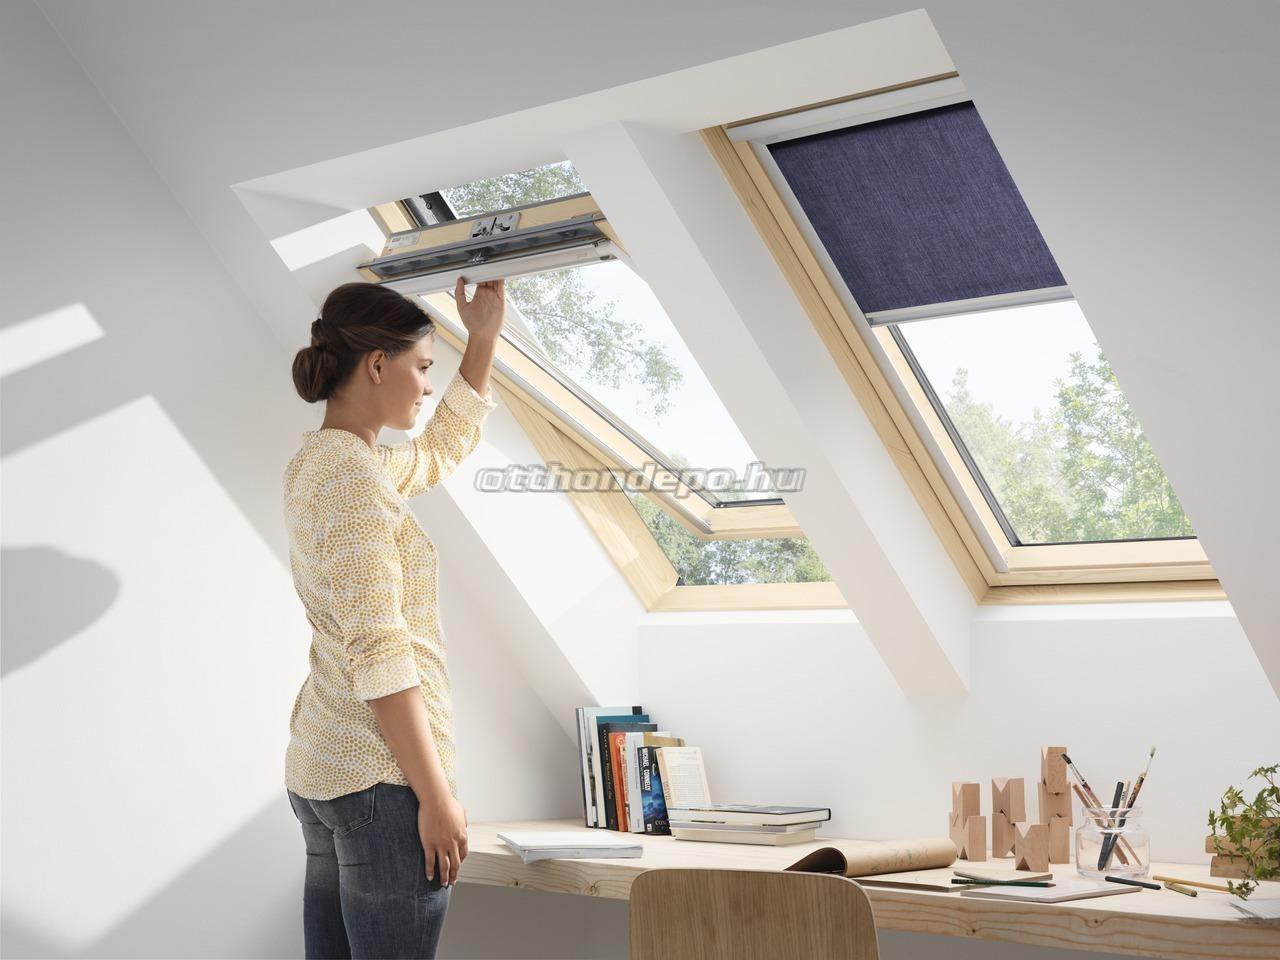 velux tet t ri ablak gll 1061 pk06 94x118 cm 3 r teg veg otthon depo web ruh z. Black Bedroom Furniture Sets. Home Design Ideas